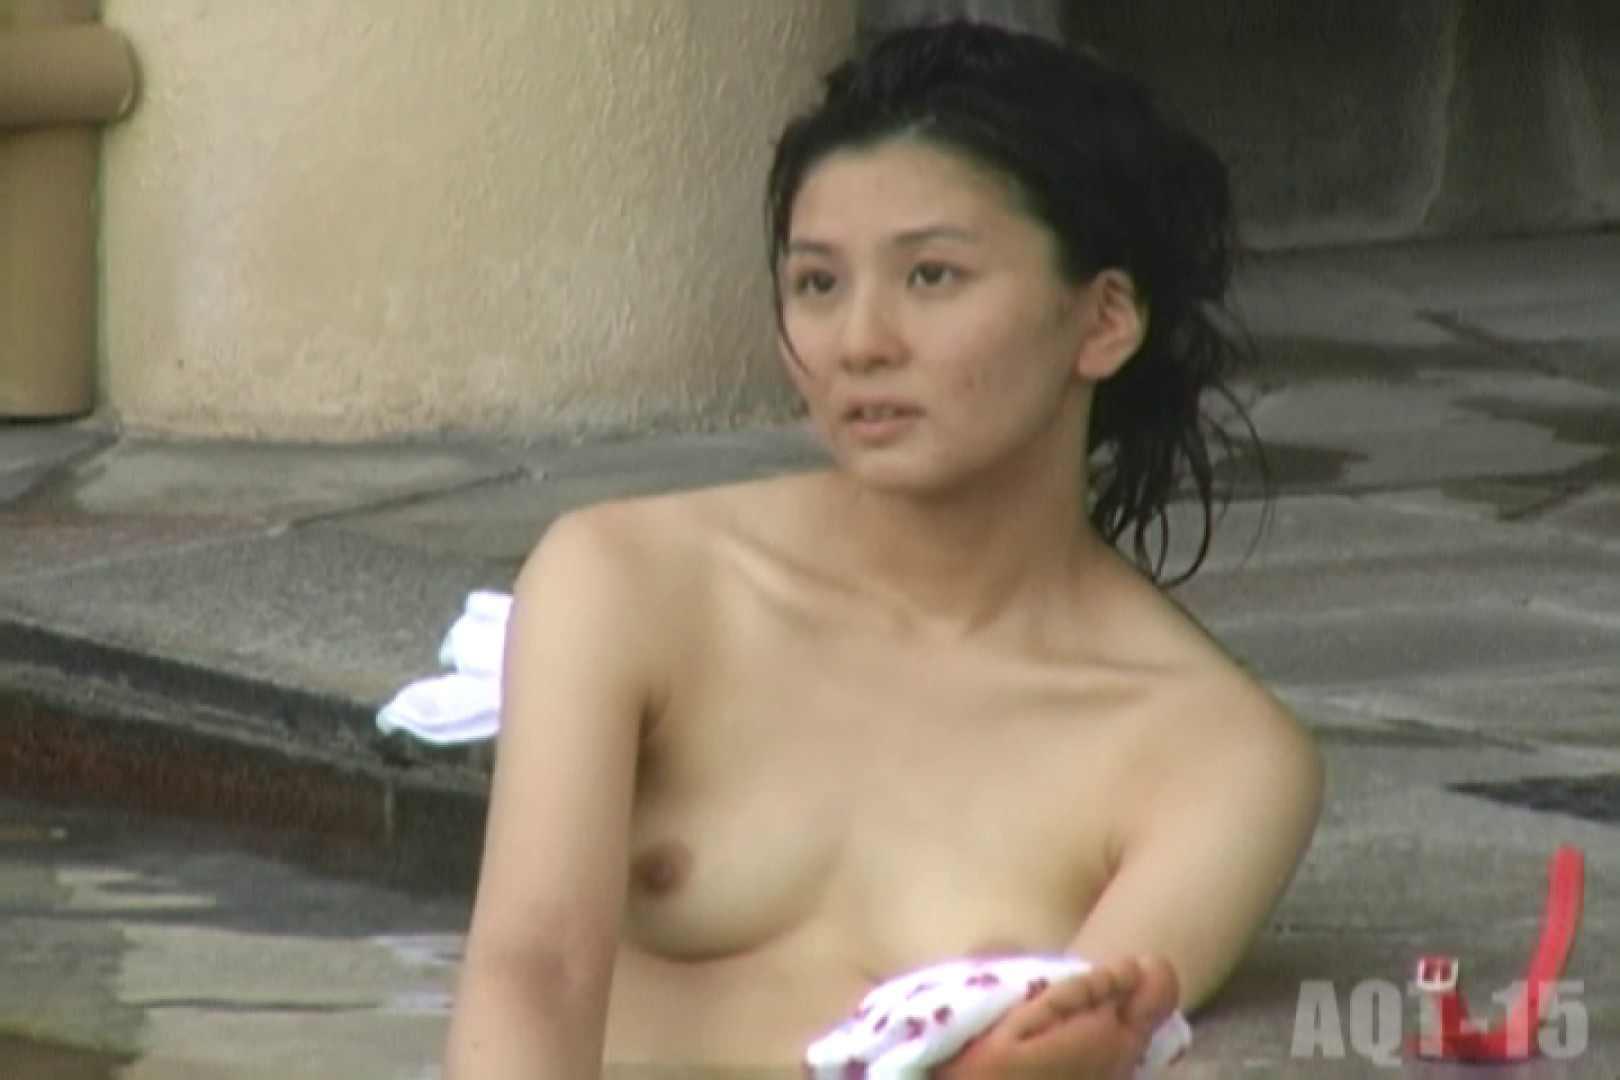 Aquaな露天風呂Vol.832 盗撮師作品 | 露天風呂突入  99pic 37